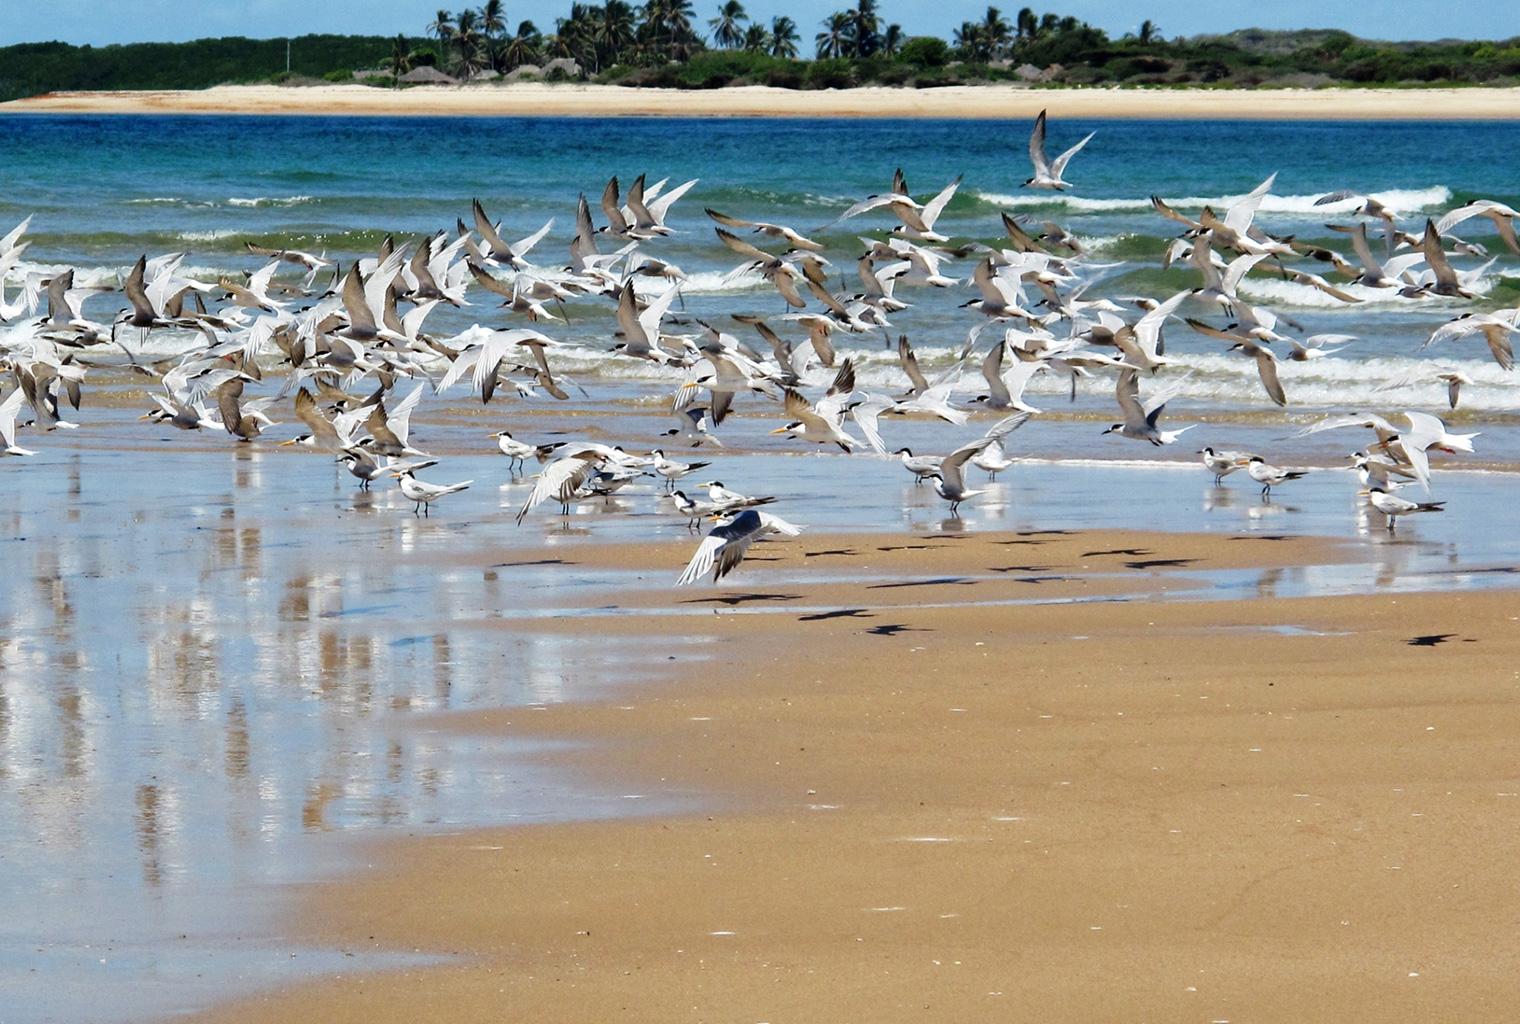 Mainland-Coast-Kenya-Birds-Beach